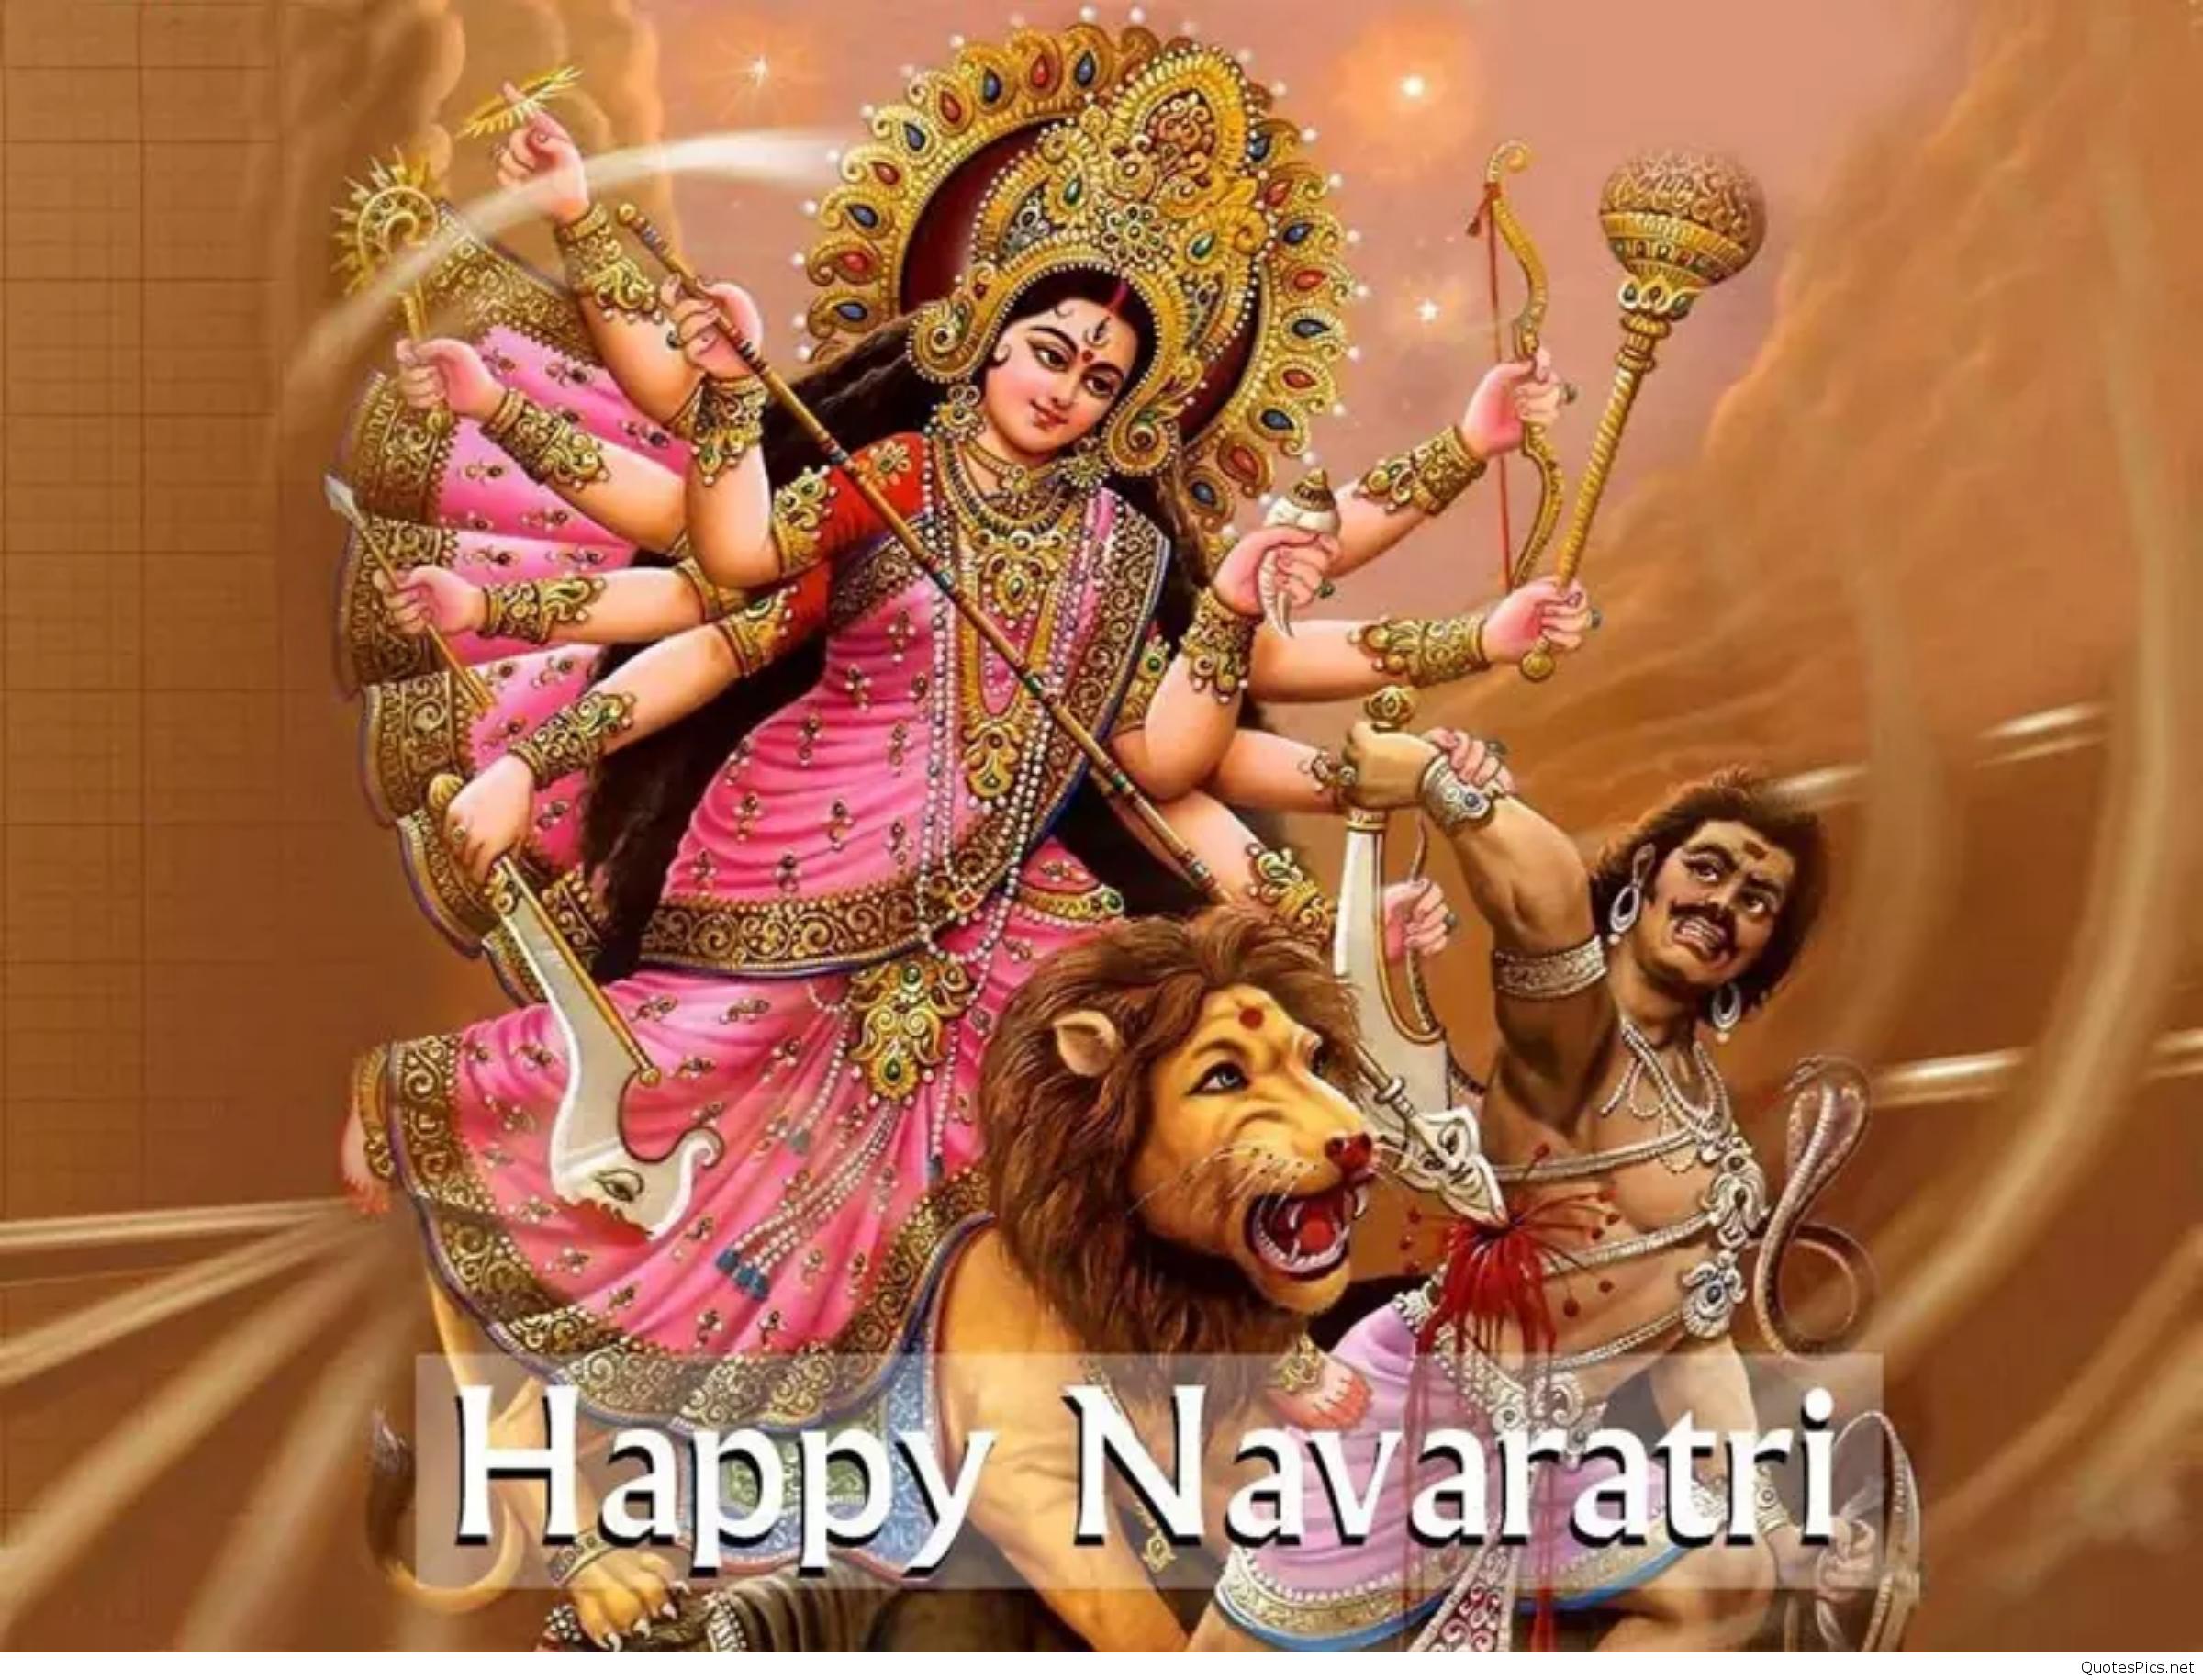 Wish You Happy Navratri D Animated Greeting Card Whatsapp